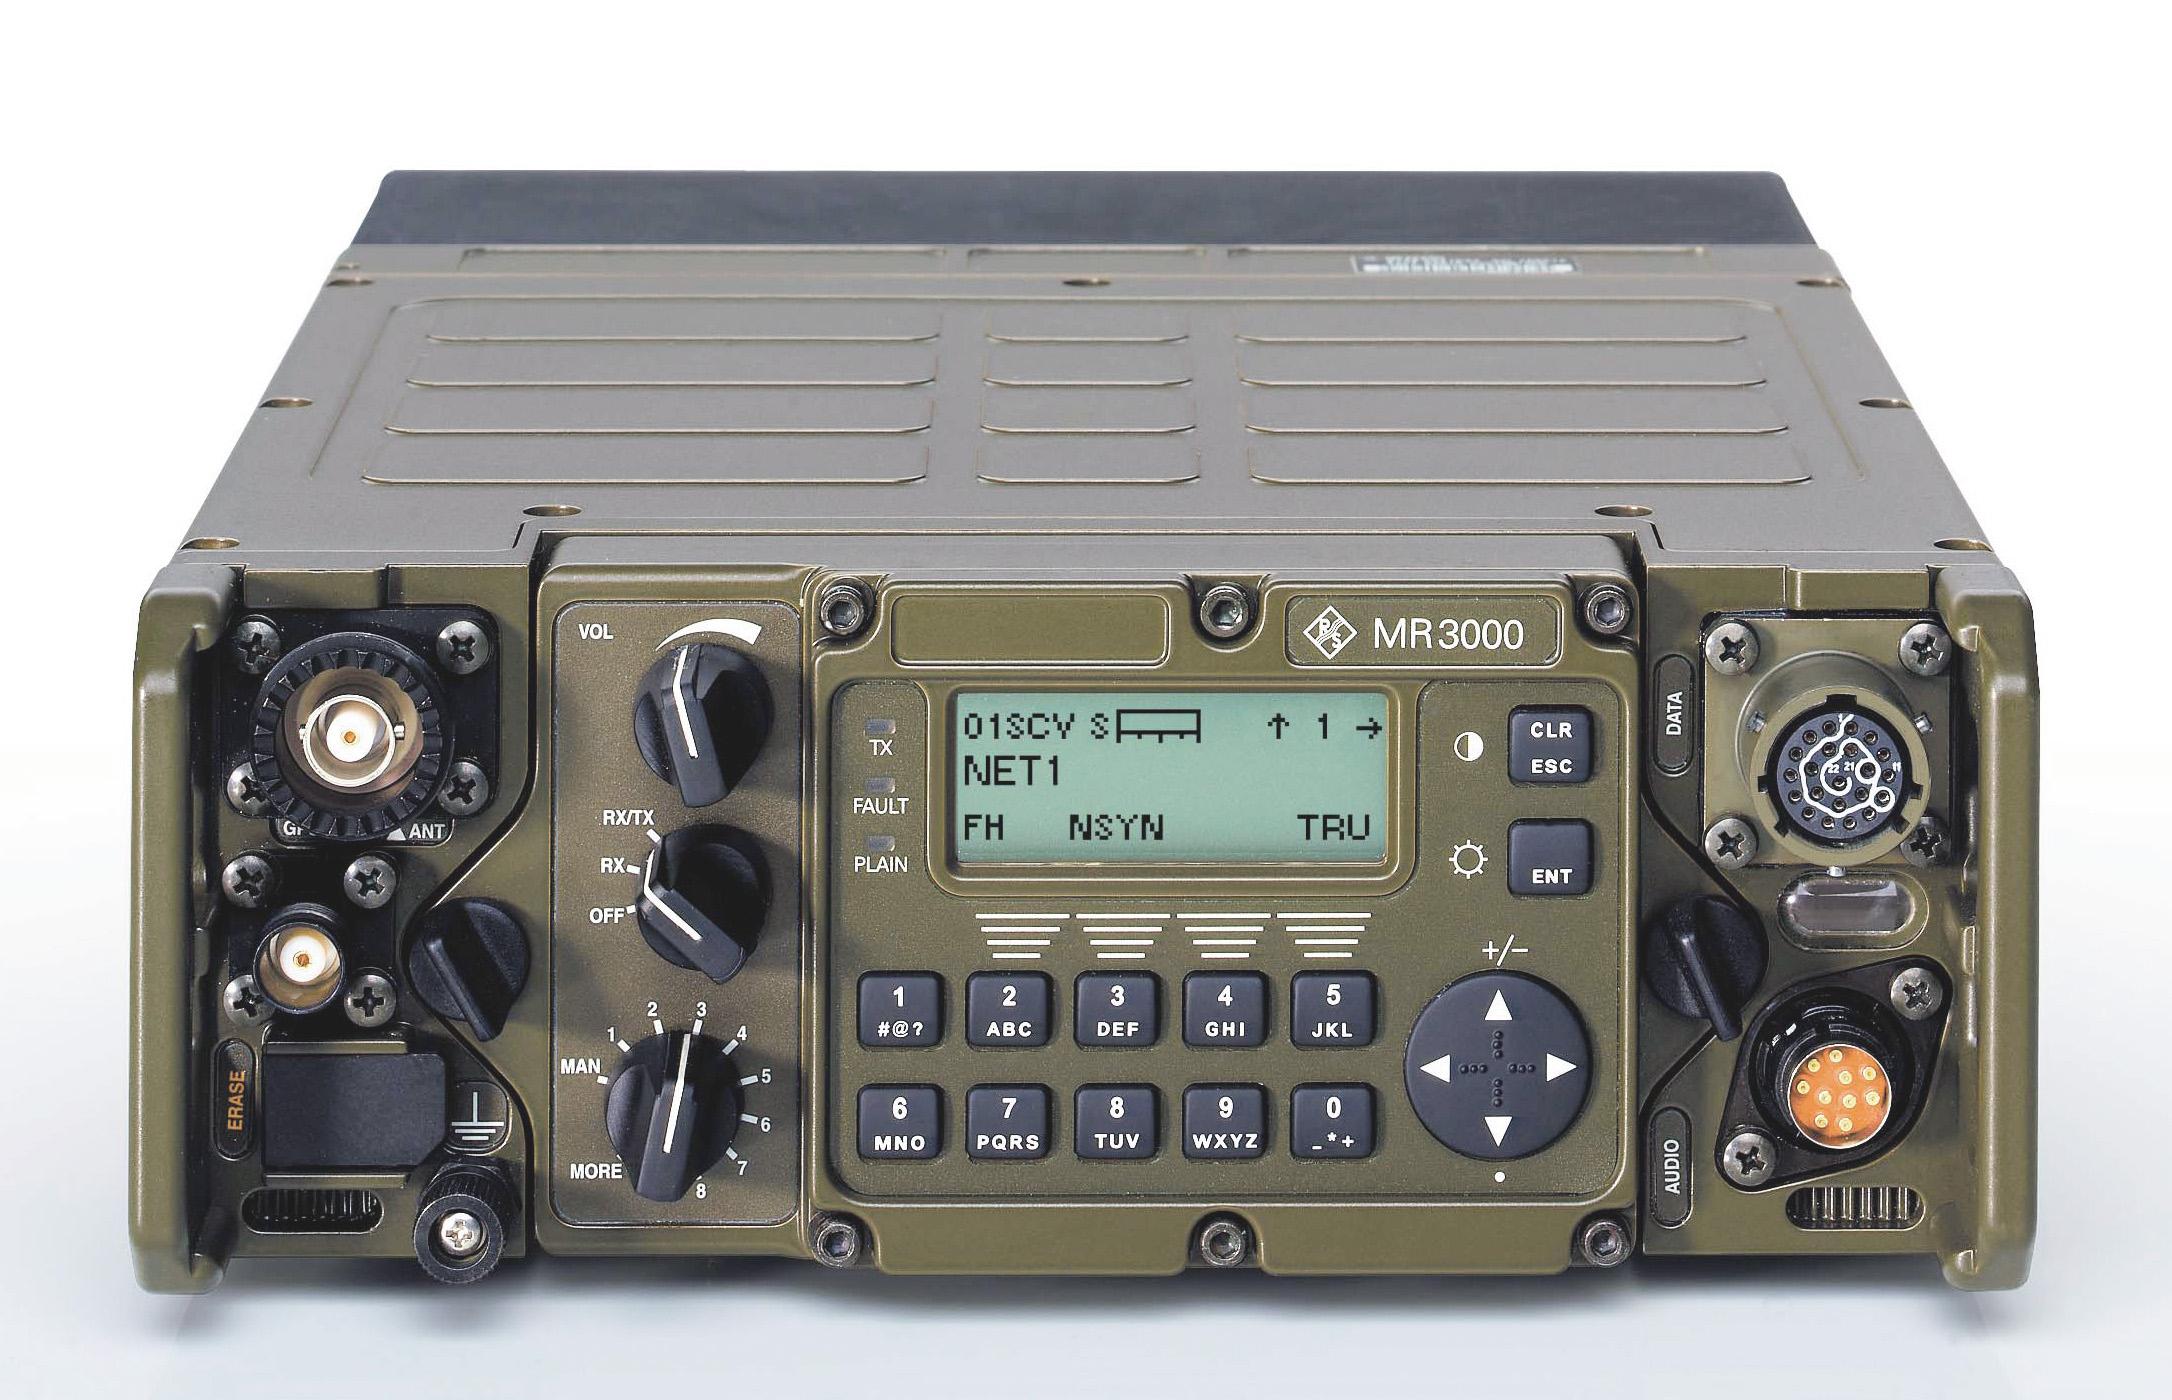 Rohde & Schwarz - Development of Software Defined Radios (SDR)